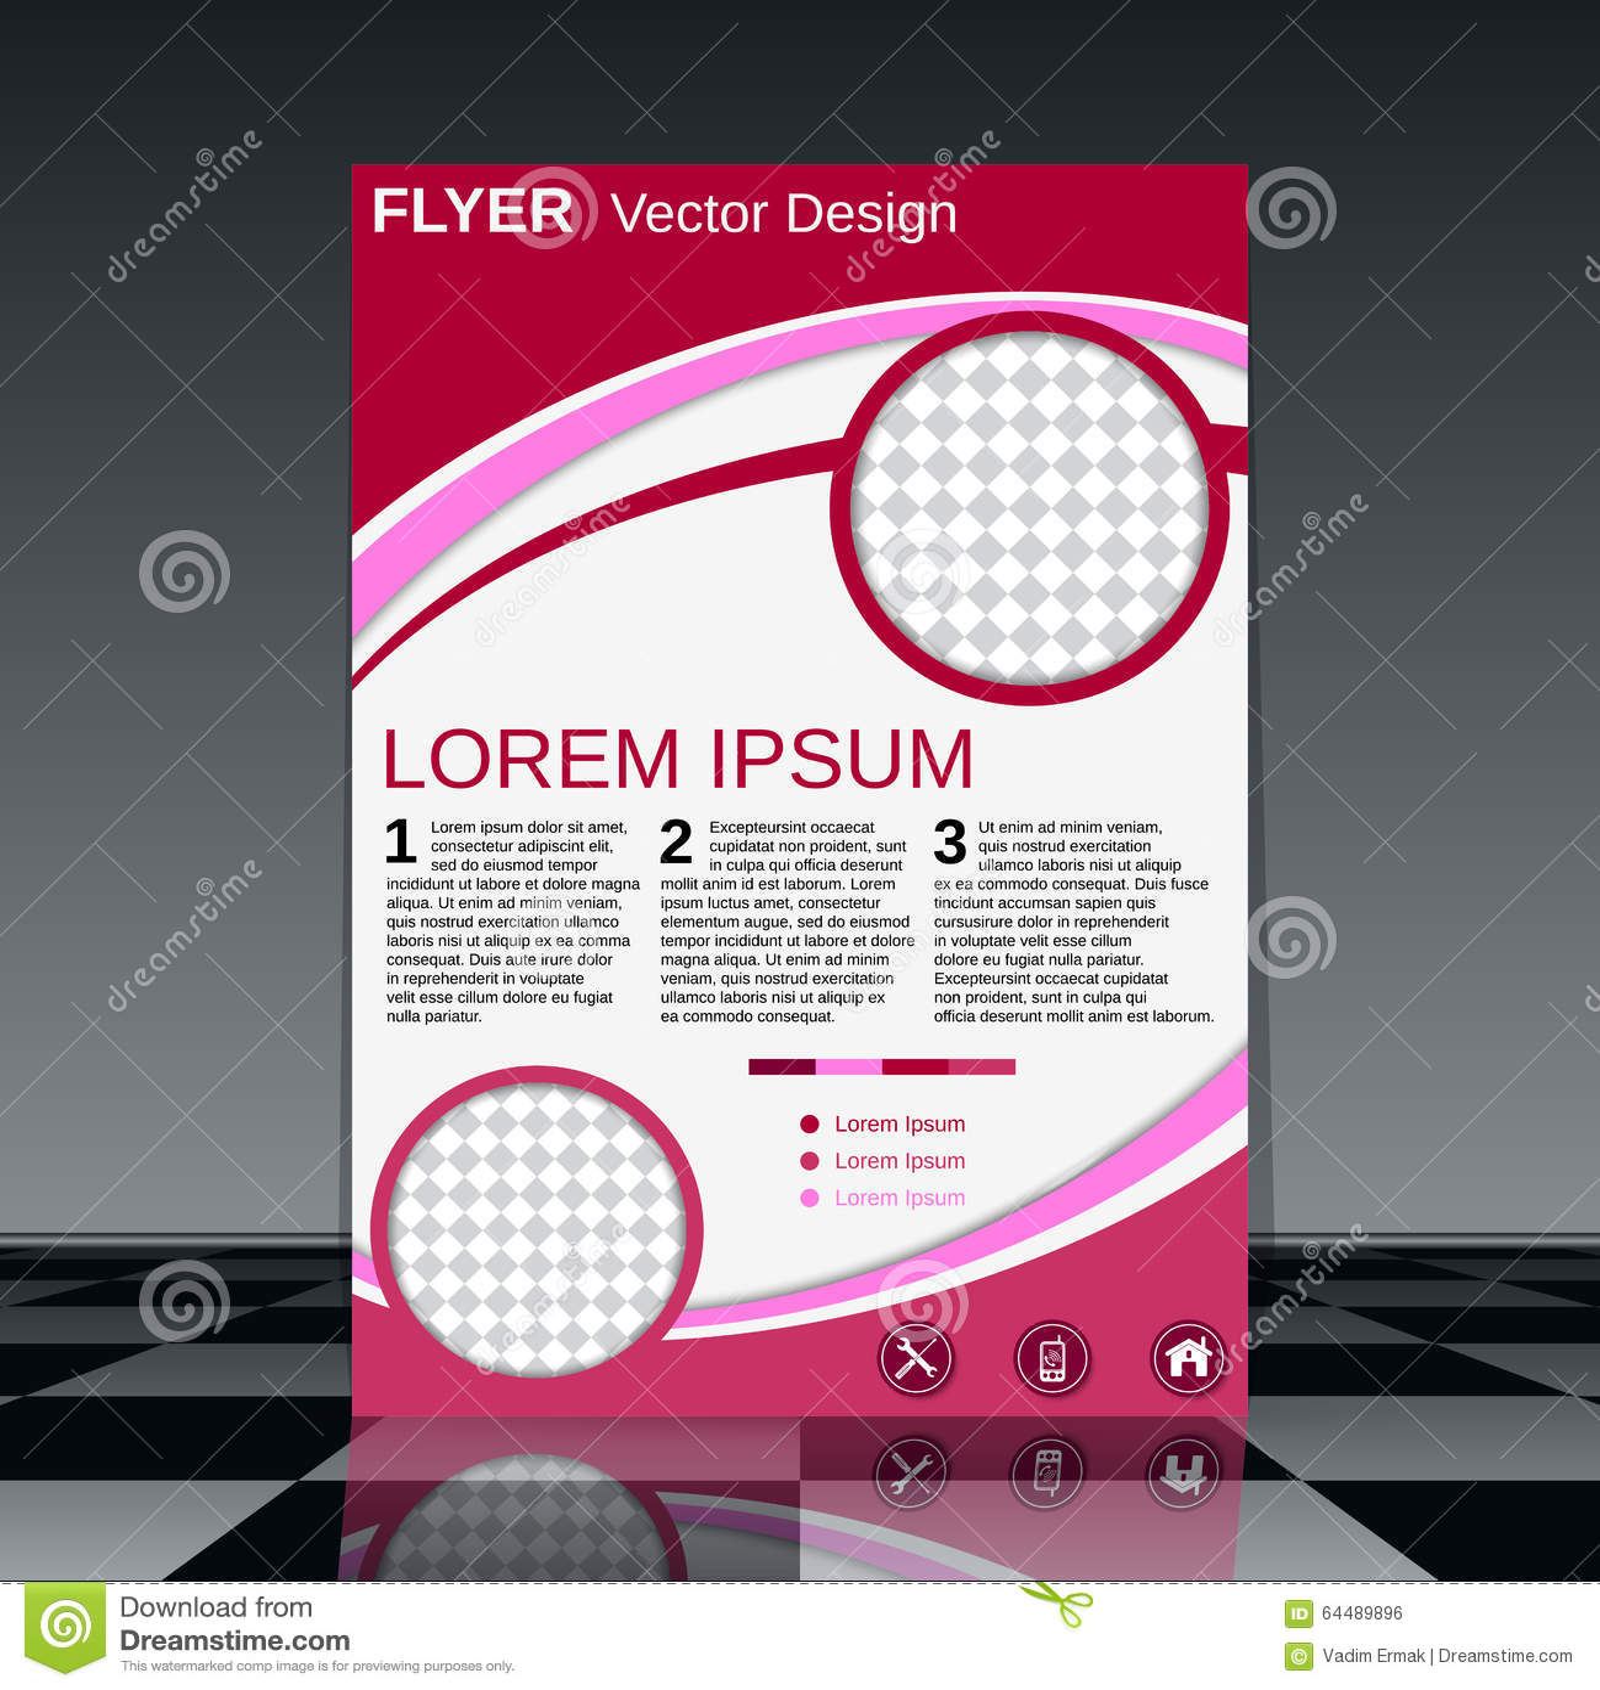 professional poster design templates professional poster design templates professional fl